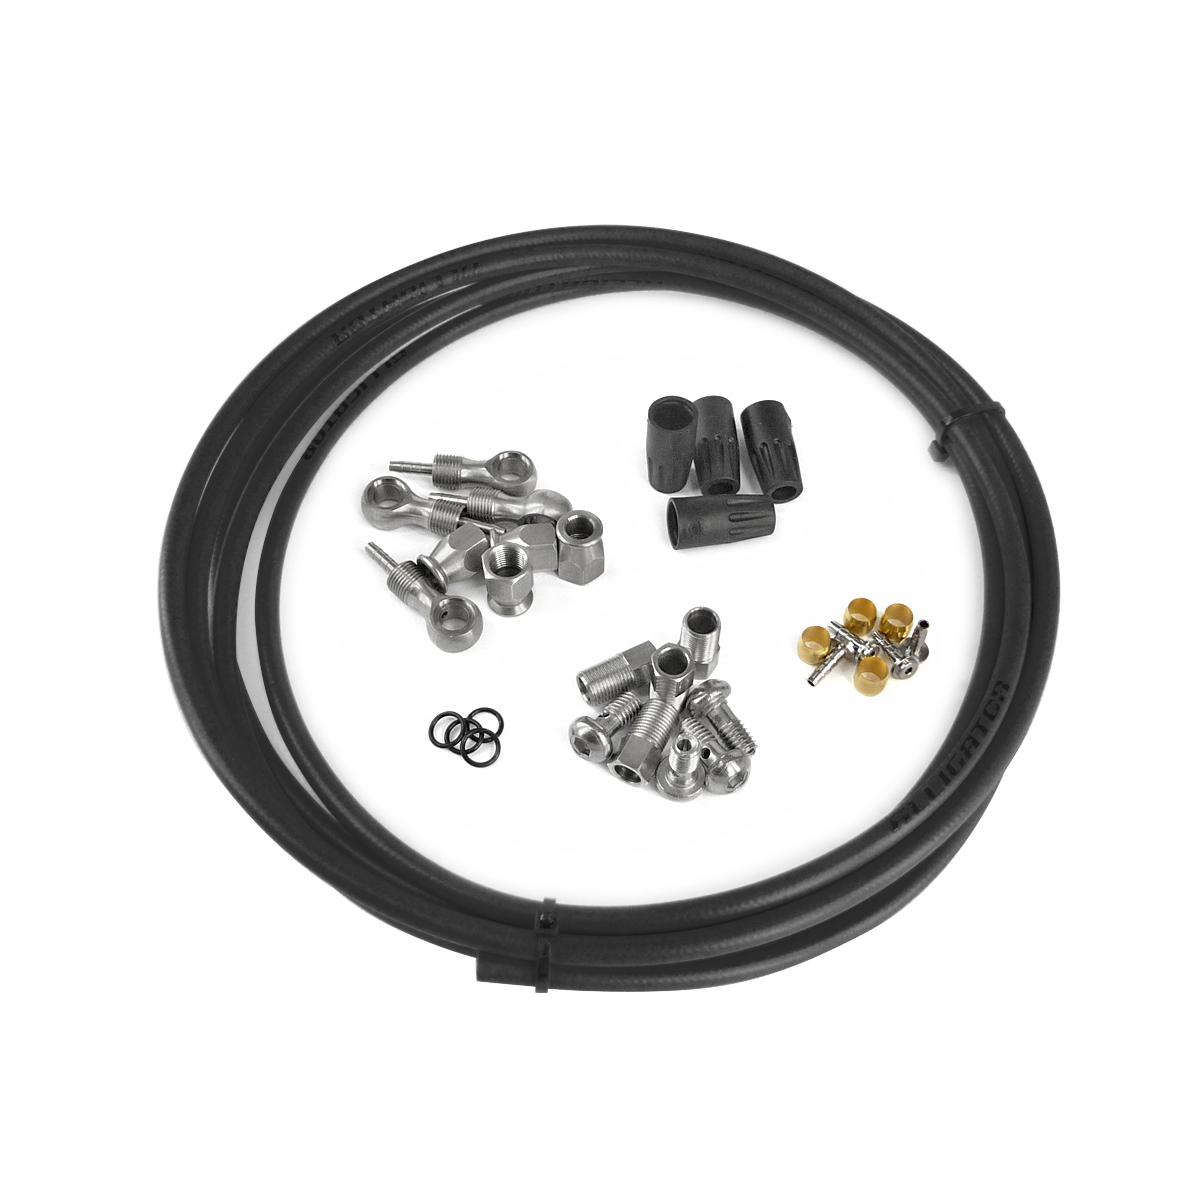 Kit complet durite frein hydraulique universel noir